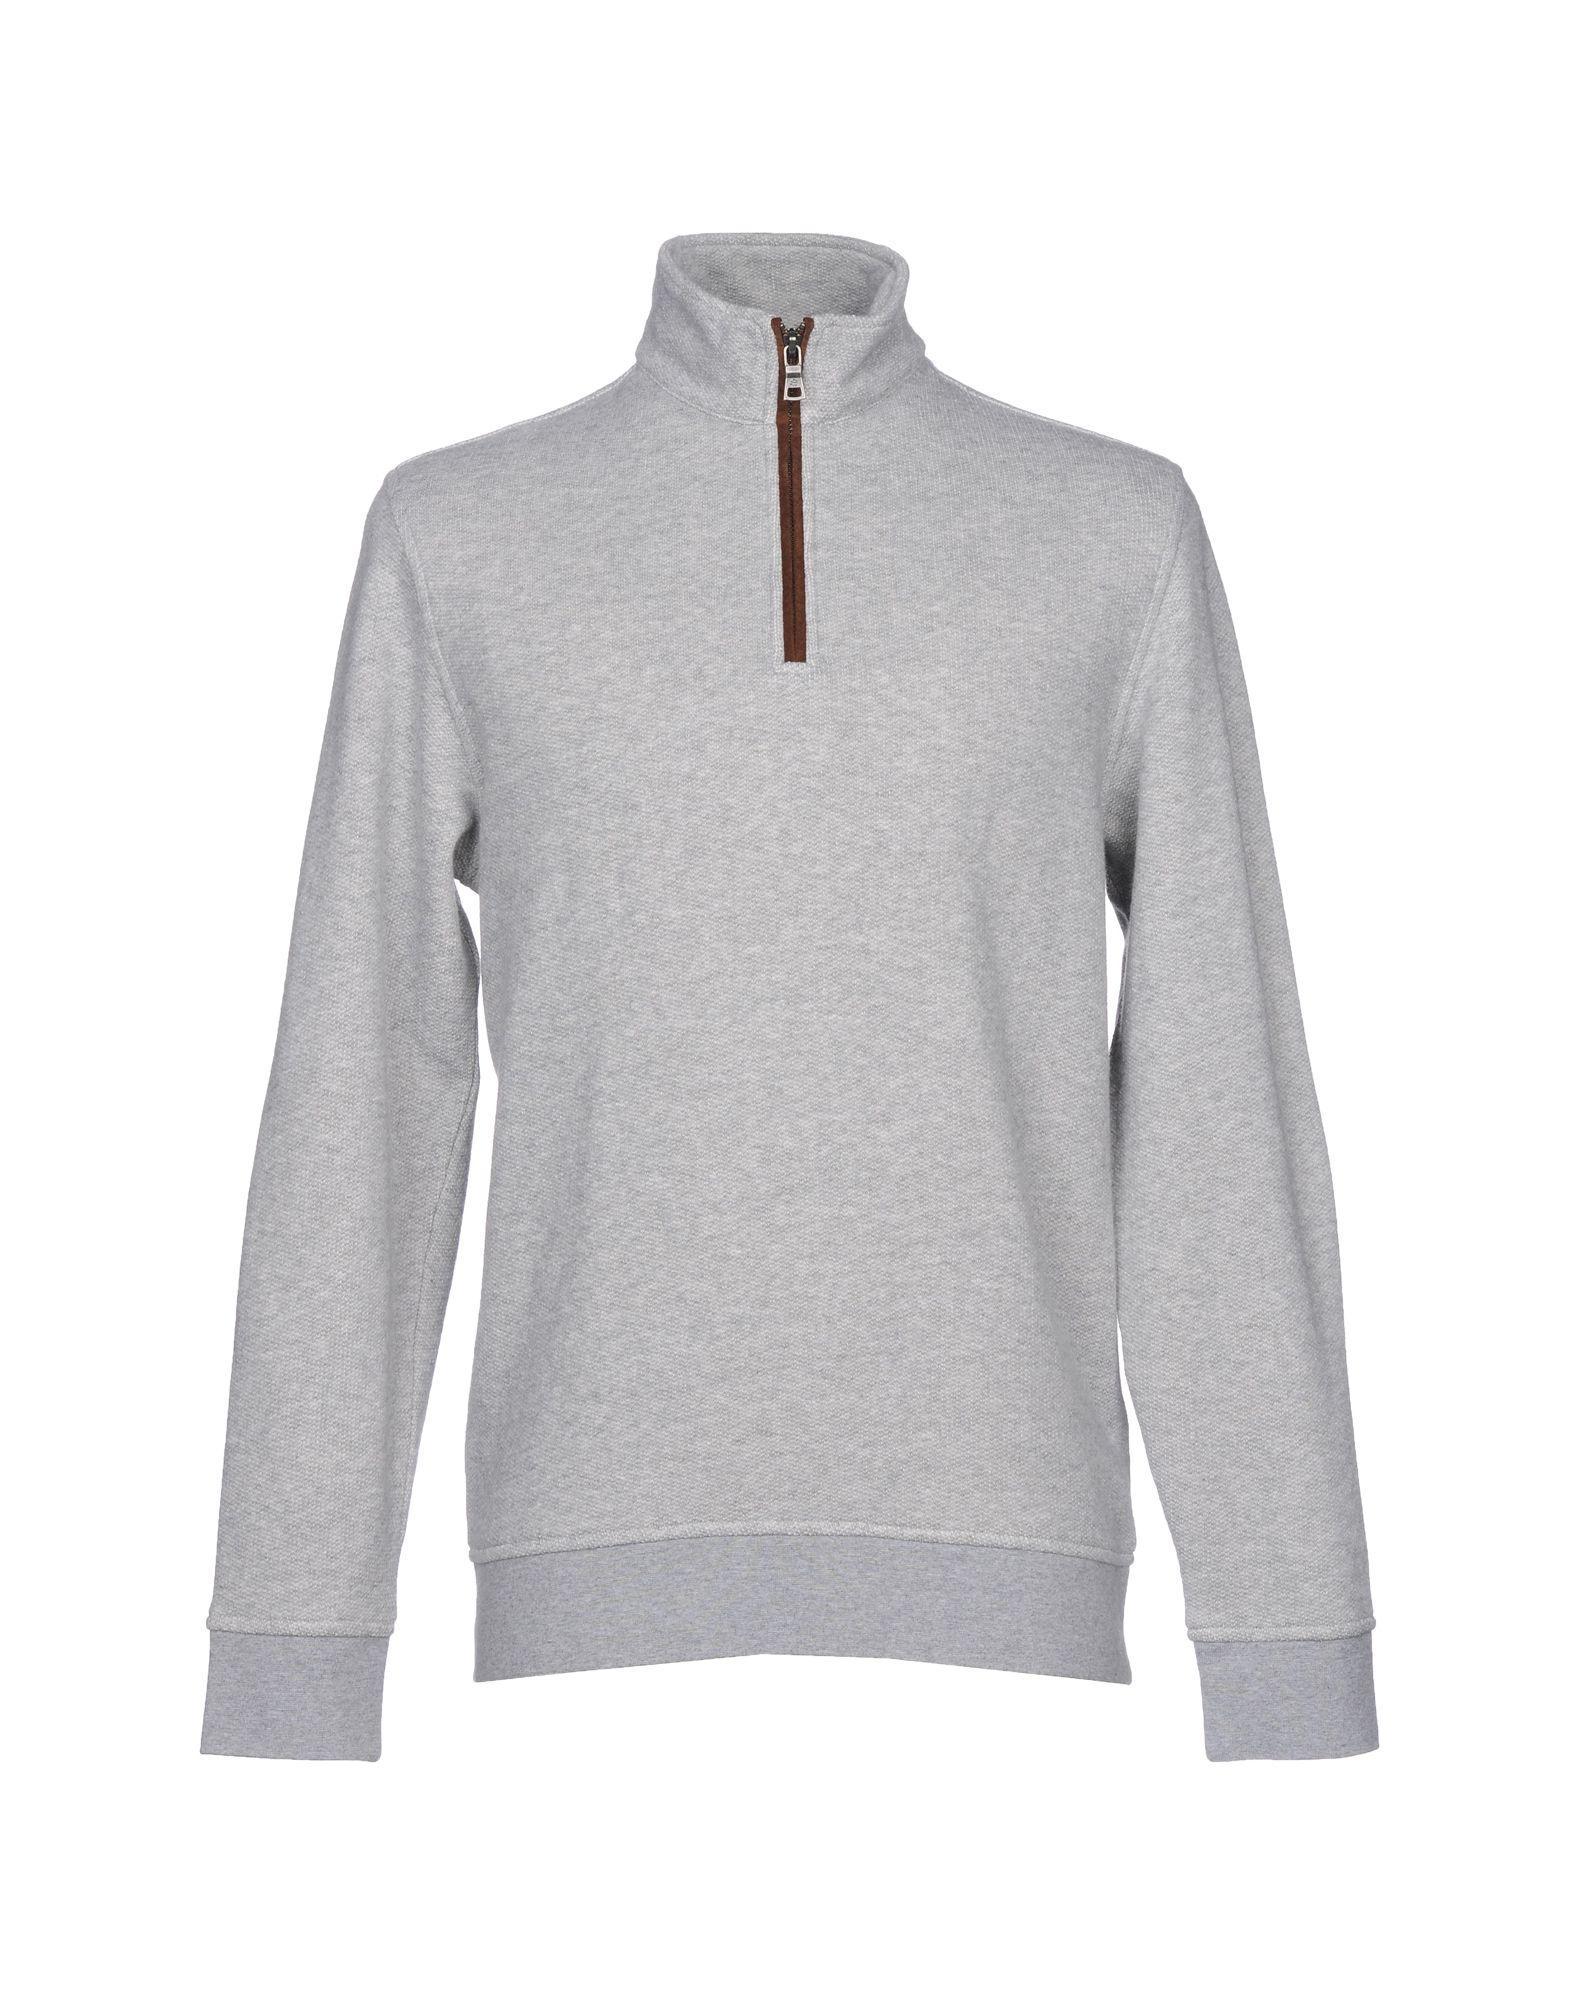 Brooks Brothers Sweatshirt In Light Grey